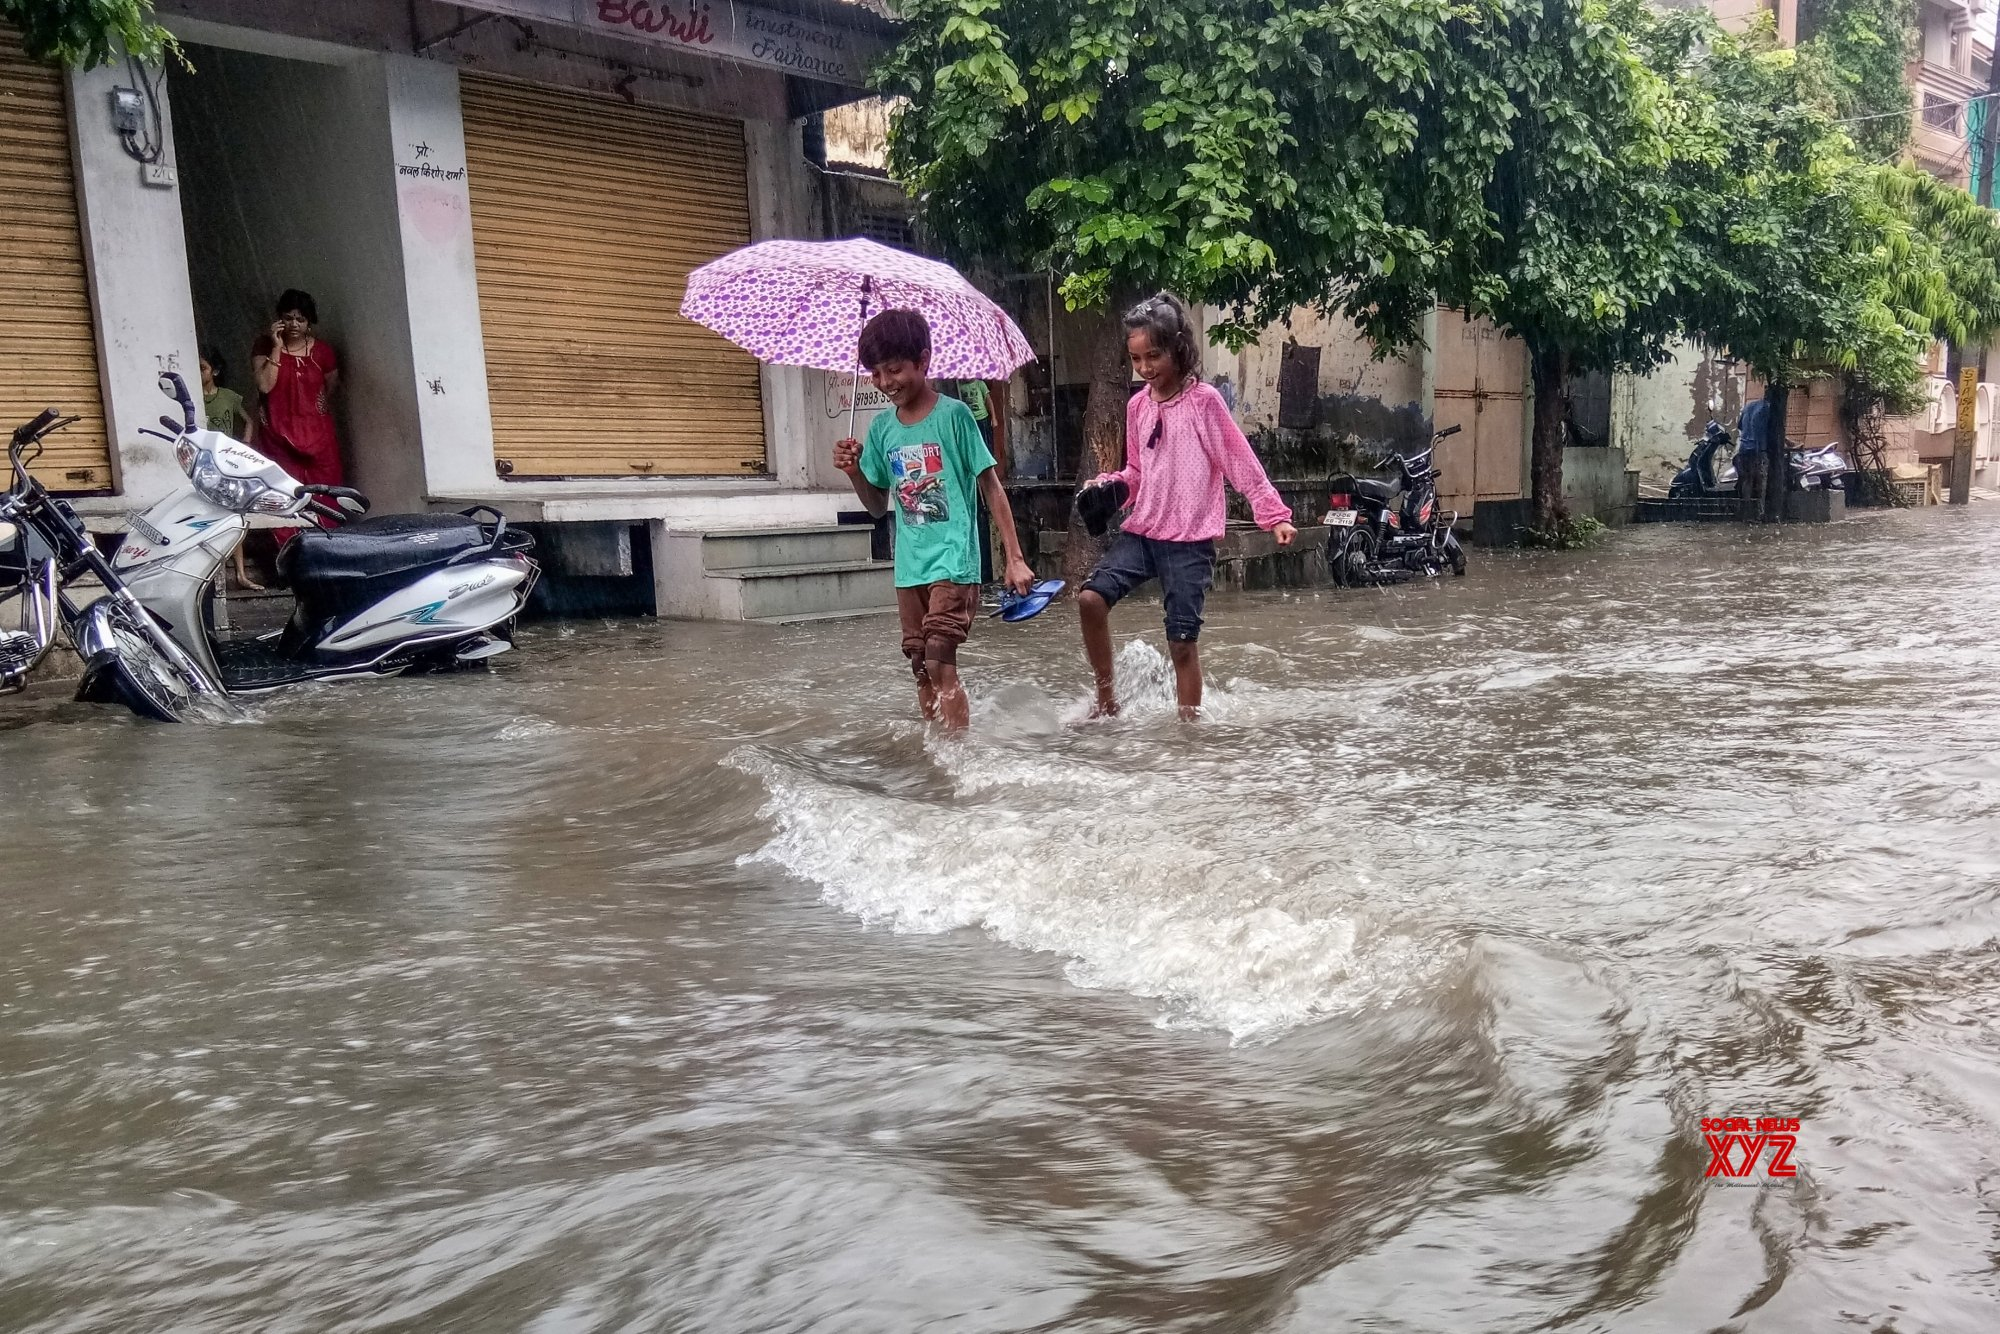 Bhilwara (Rajasthan): Water - logged streets after heavy rains #Gallery